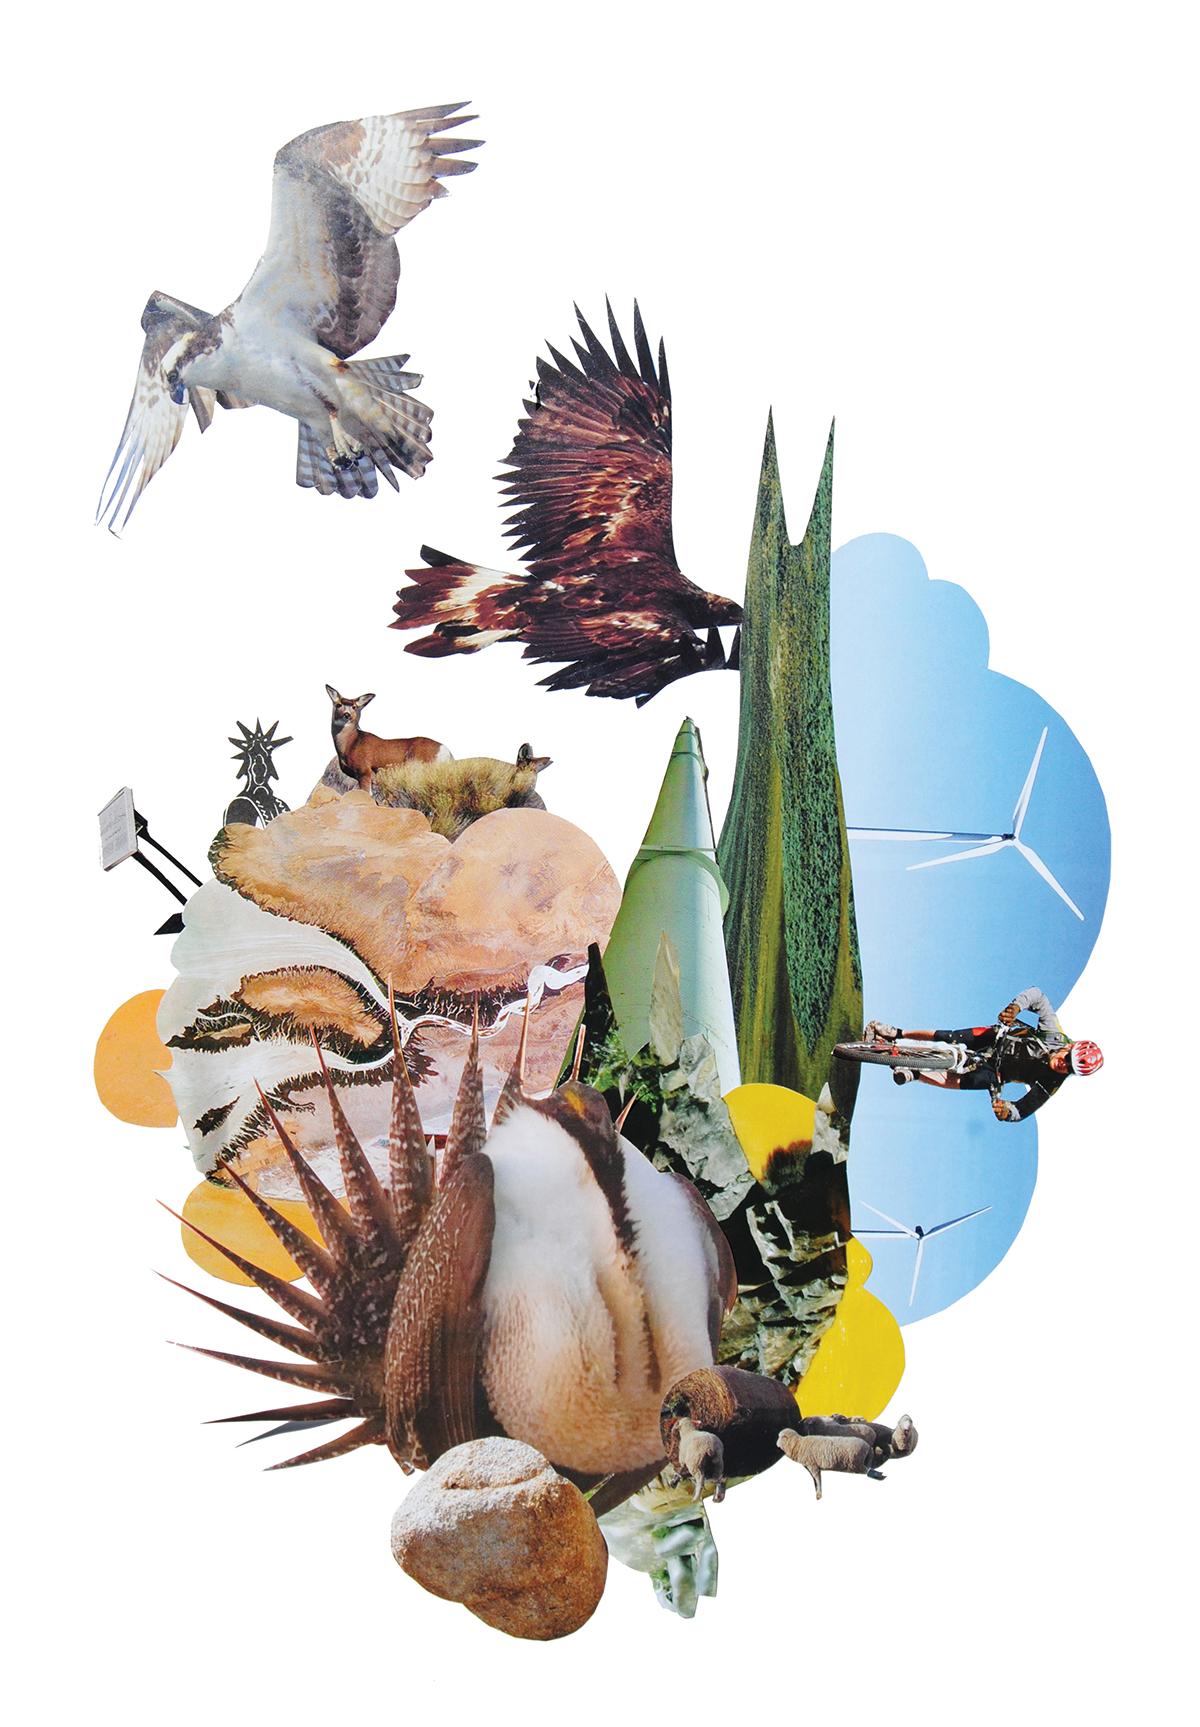 Animal collage with birds, sagegrouse, biker, windmills, and ungulates